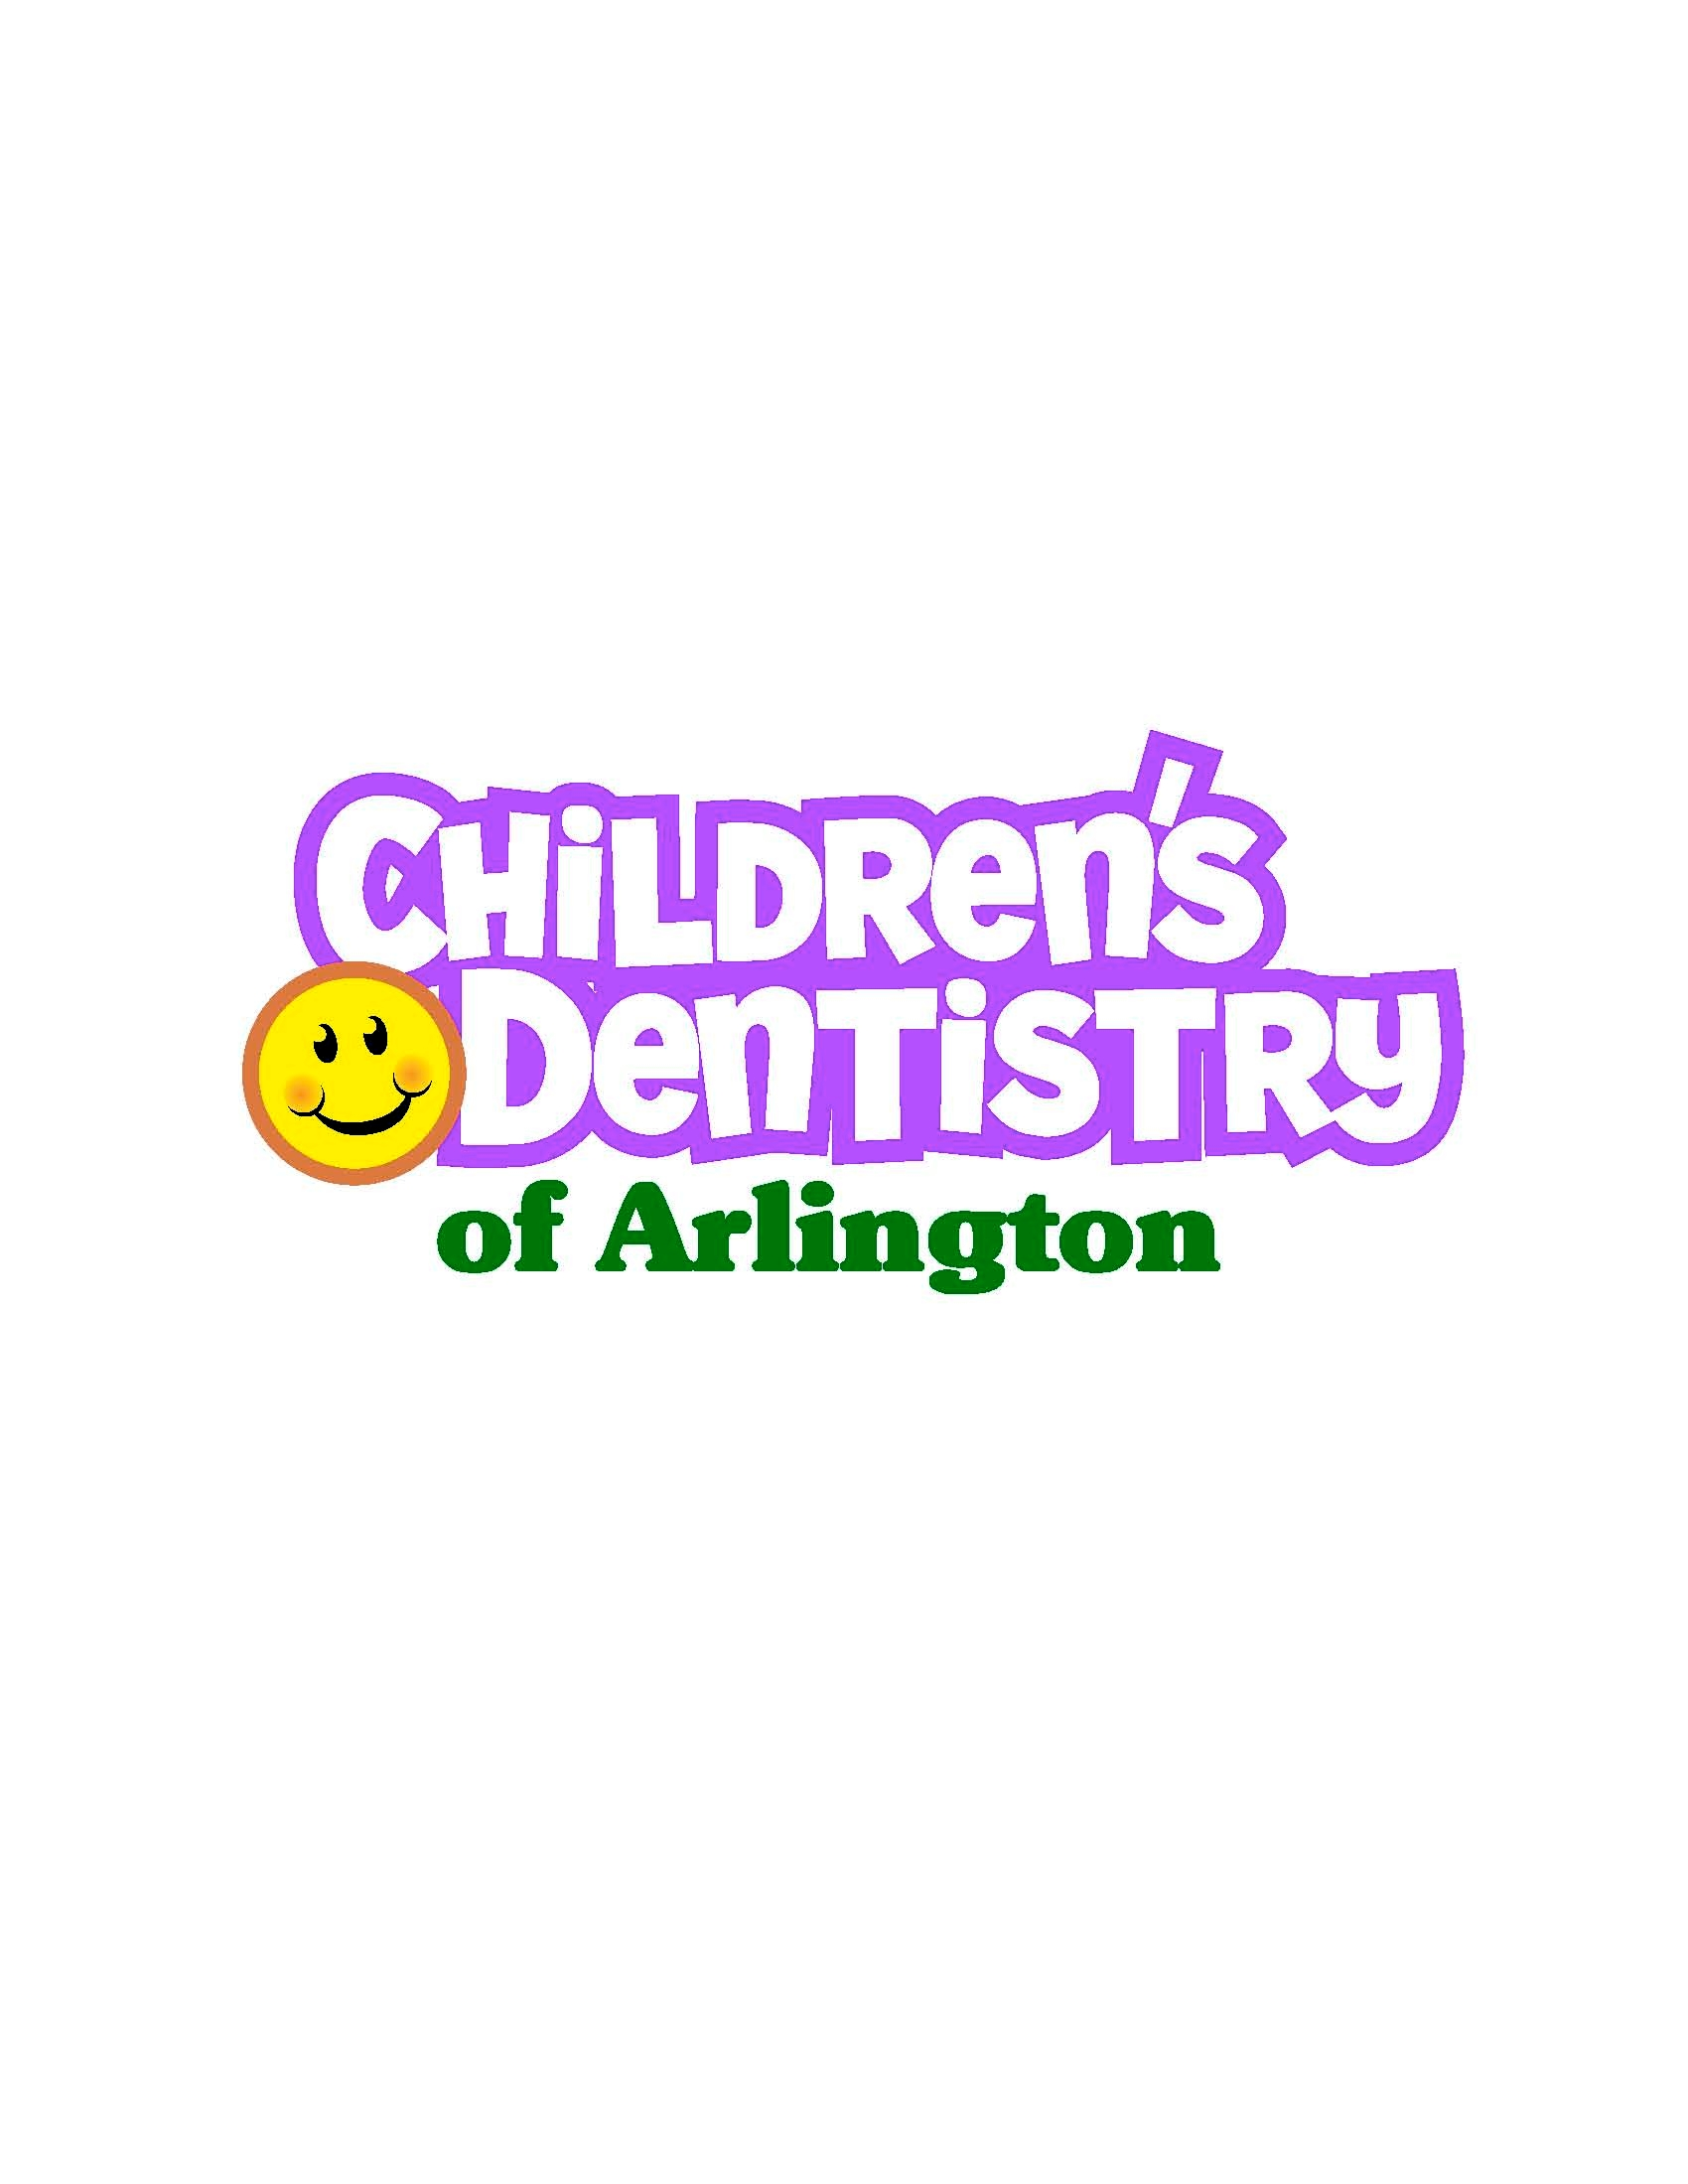 Childrens Dentistry of Arlington